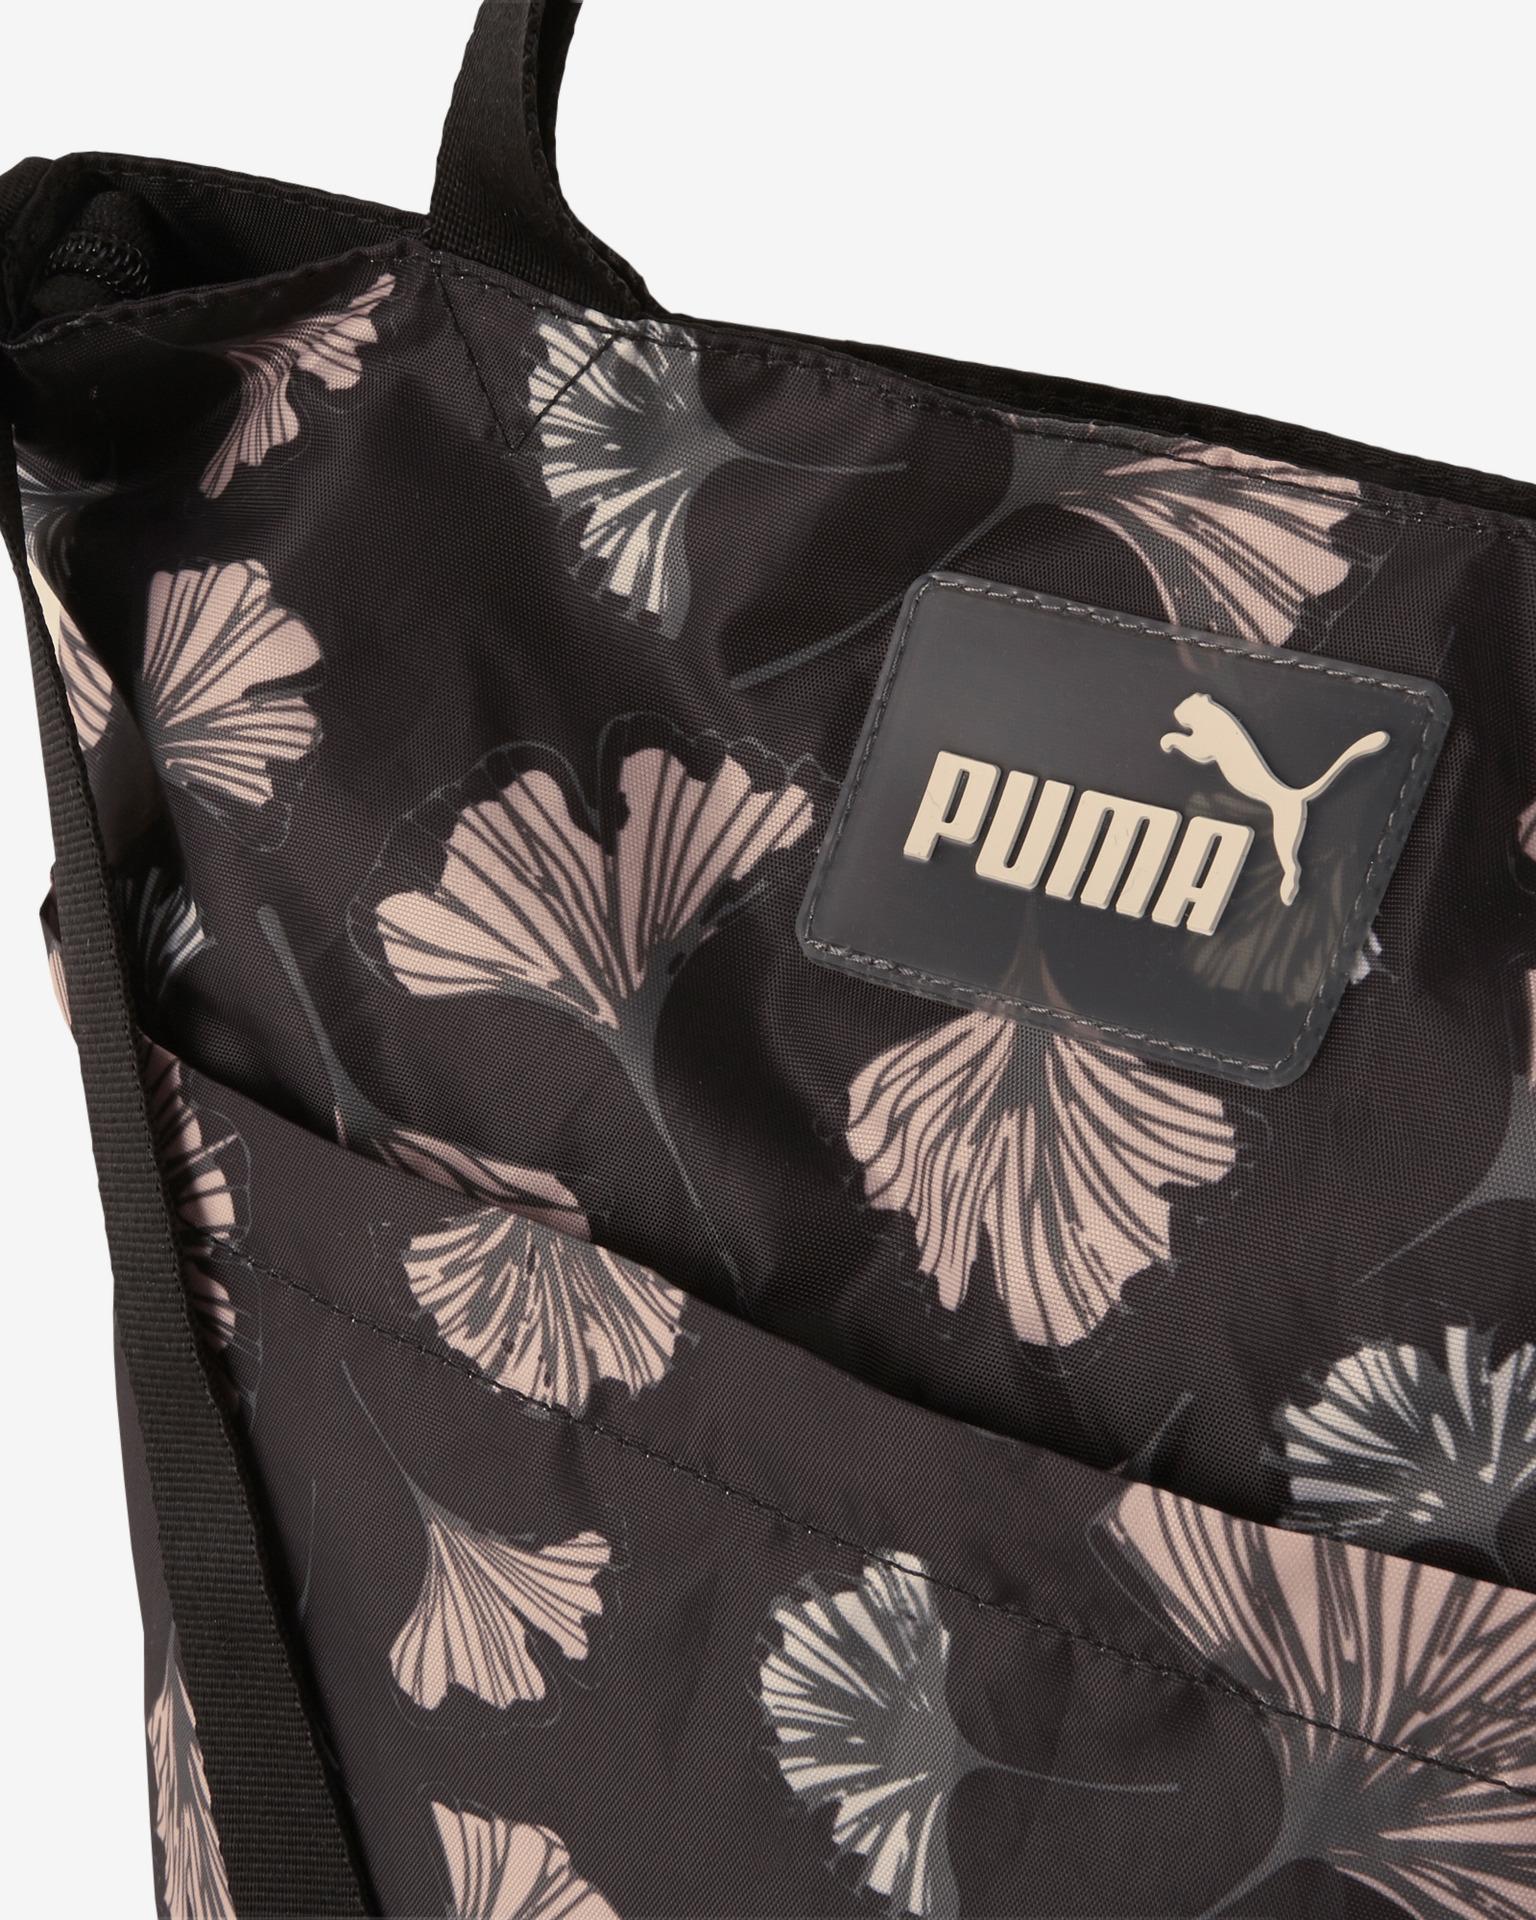 Puma Ženske torbice črna  Pop